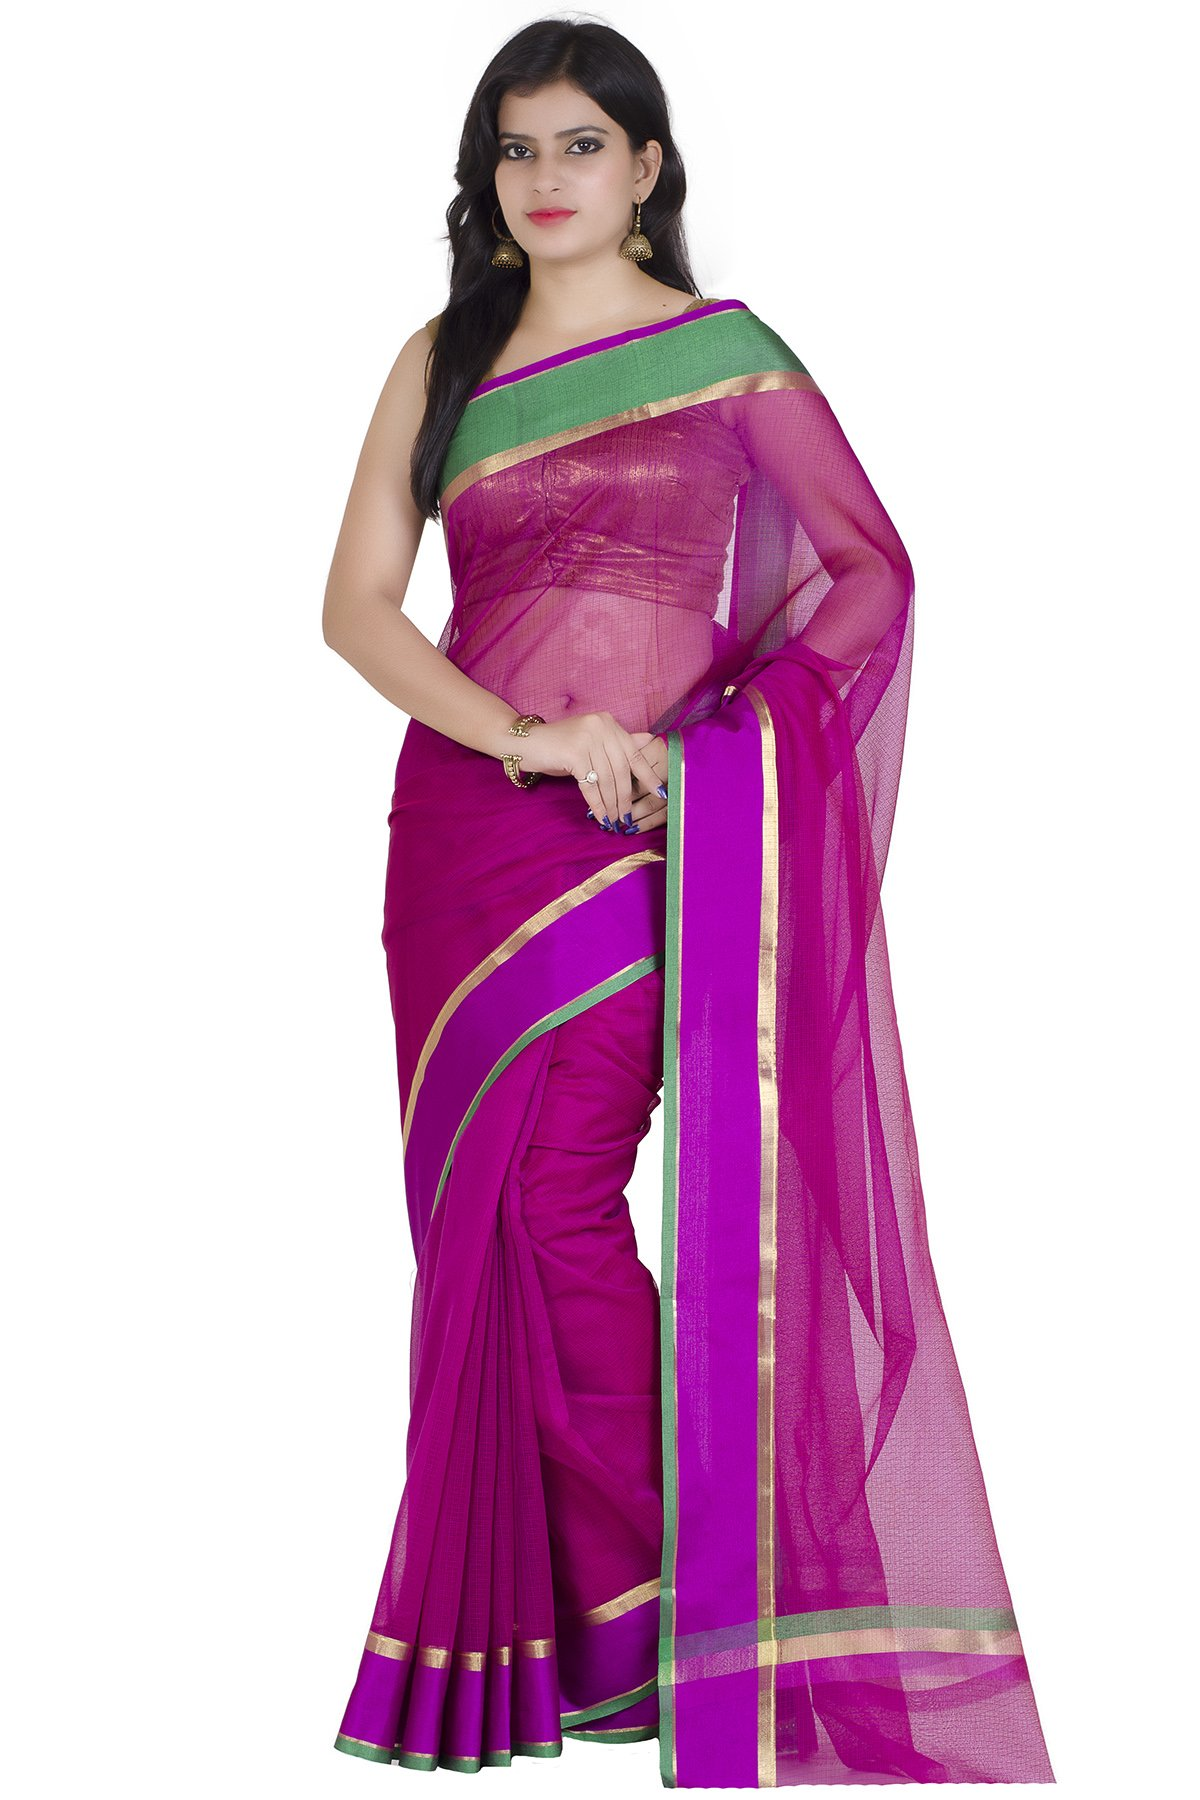 Chandrakala Women's Purple Cotton Blend Banarasi Saree(9507)